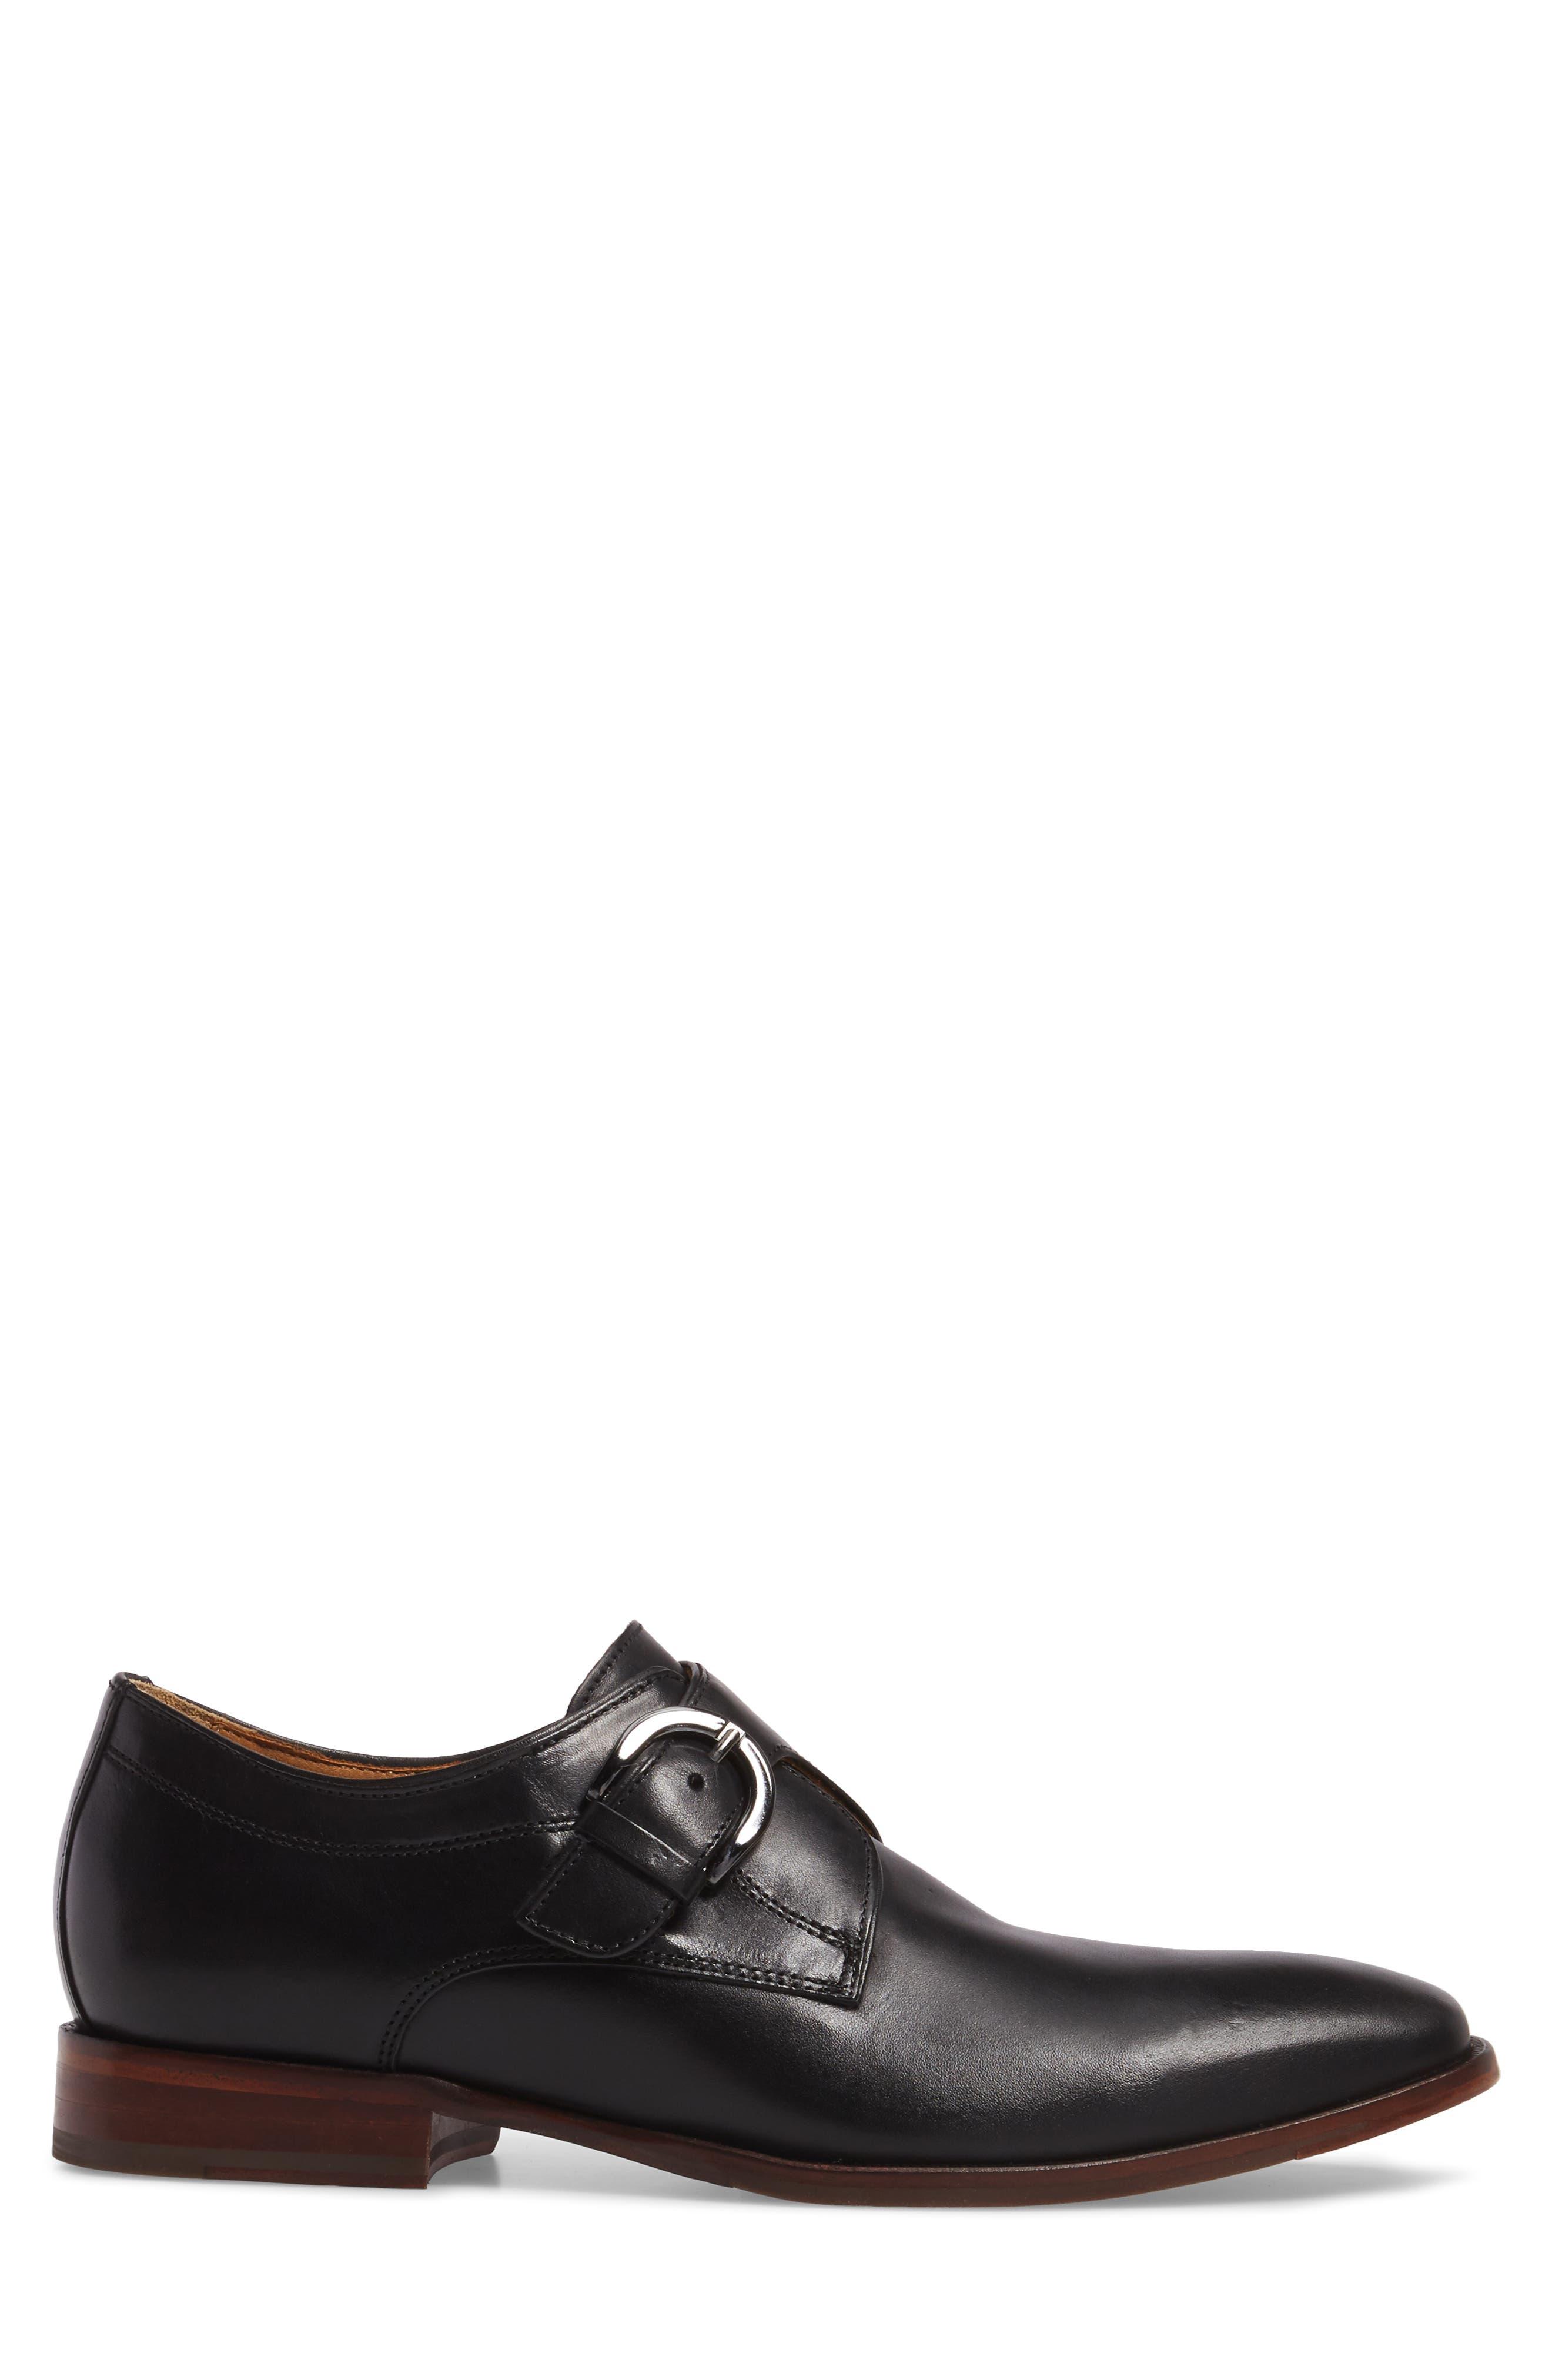 JOHNSTON & MURPHY, McClain Monk Strap Shoe, Alternate thumbnail 3, color, BLACK